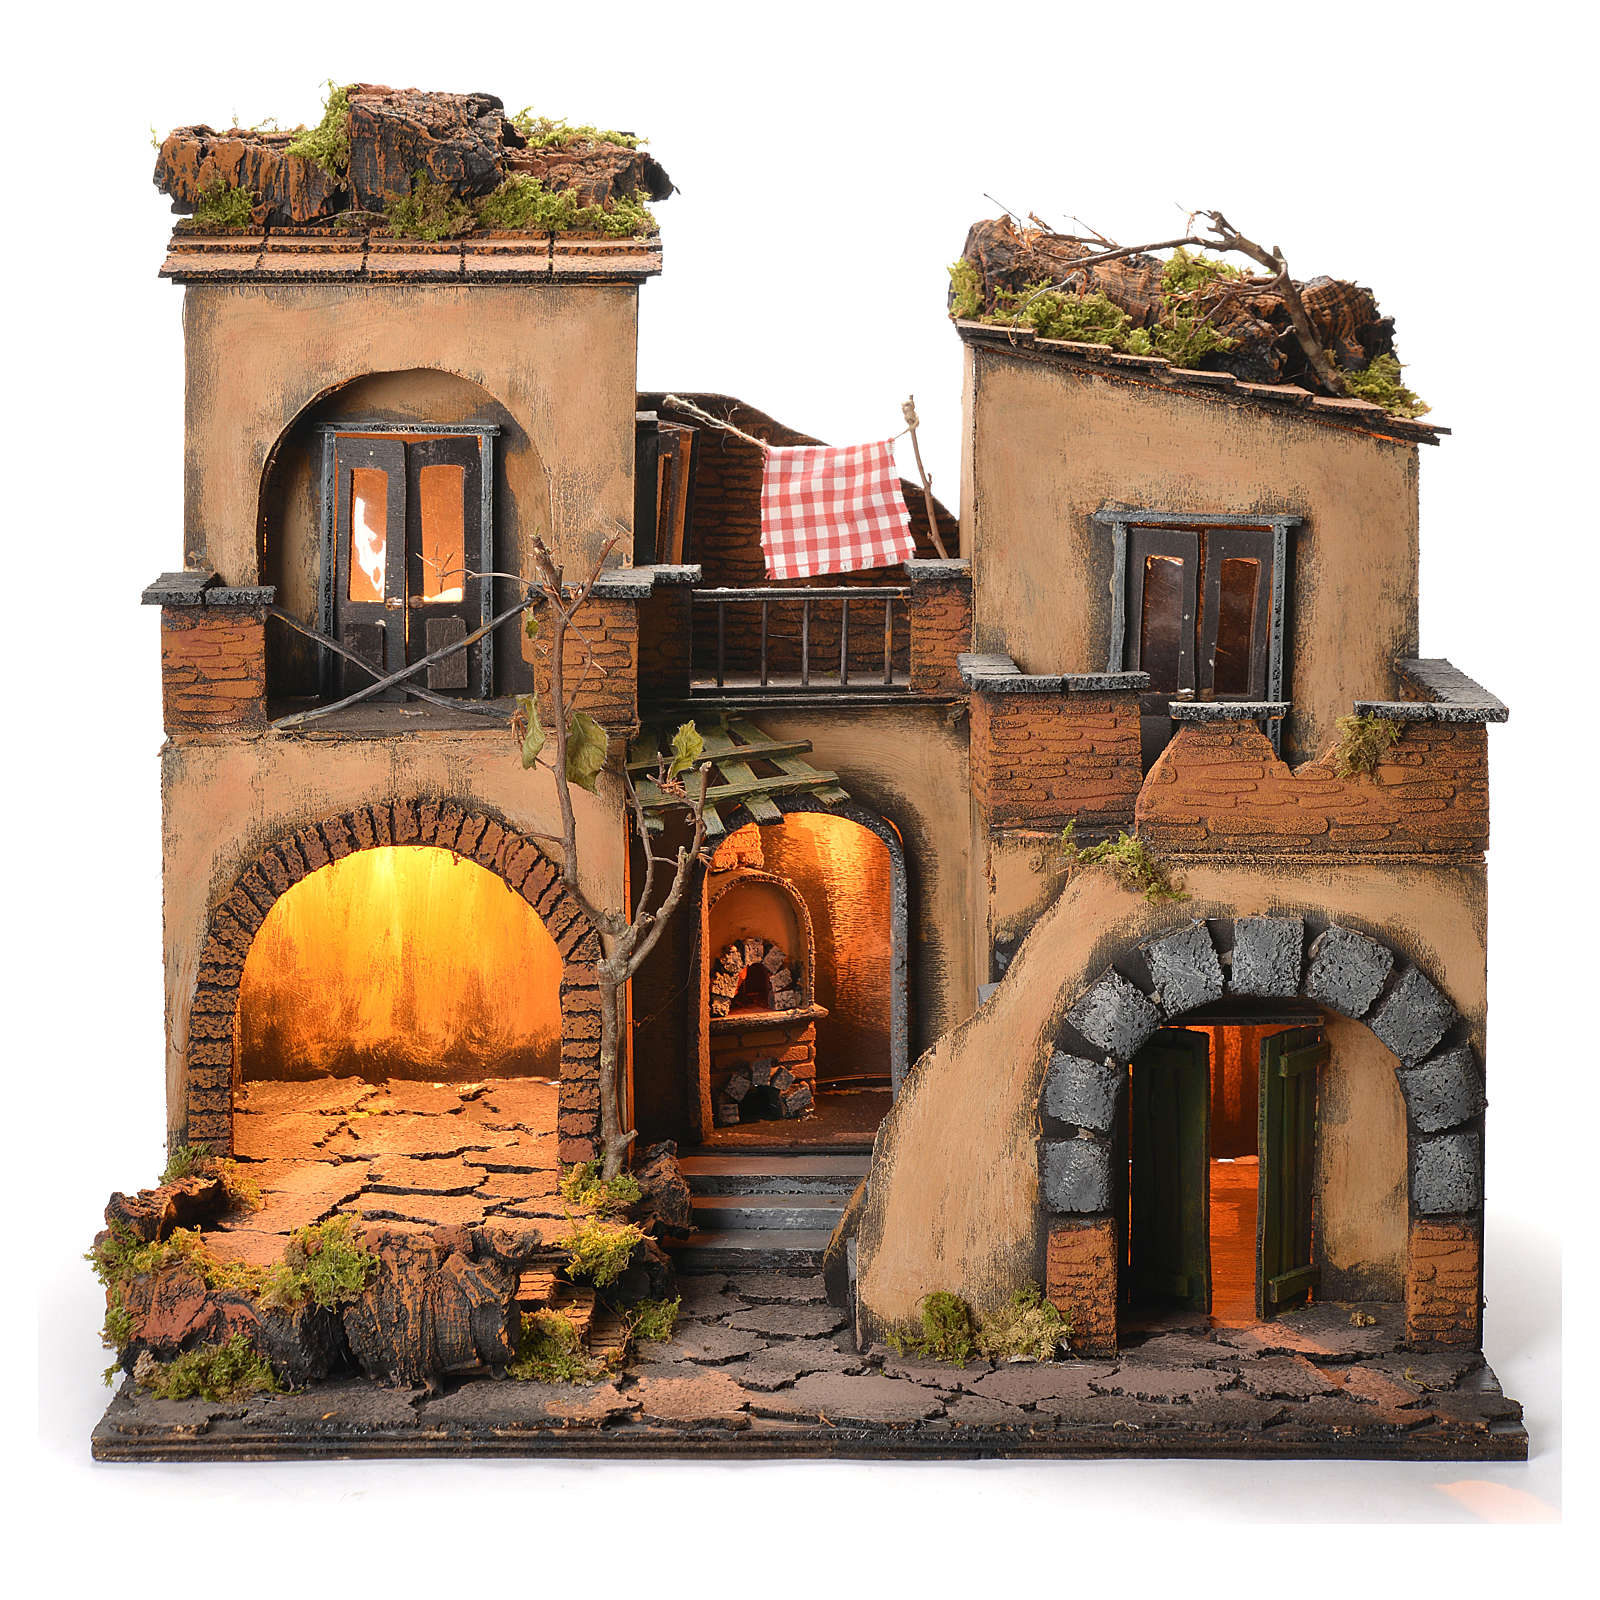 Borgo presepe napoletano stile 700 doppio arco cm 43x40x50 4